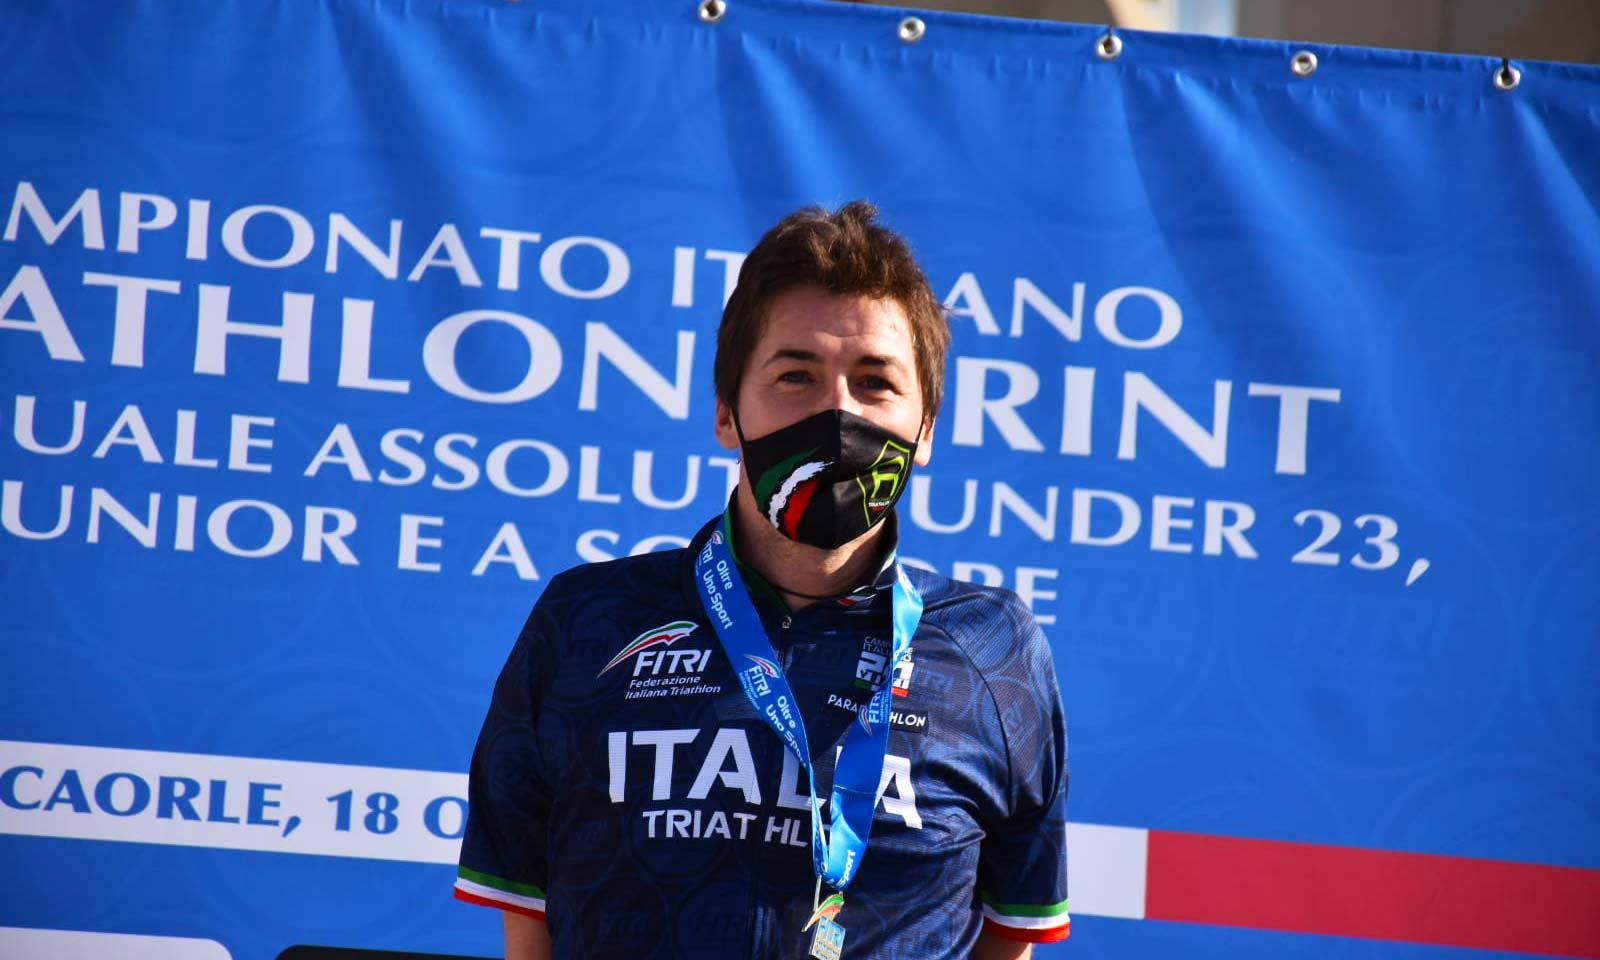 triathlon-pavese-raschiani-pavia-cycling-running-19